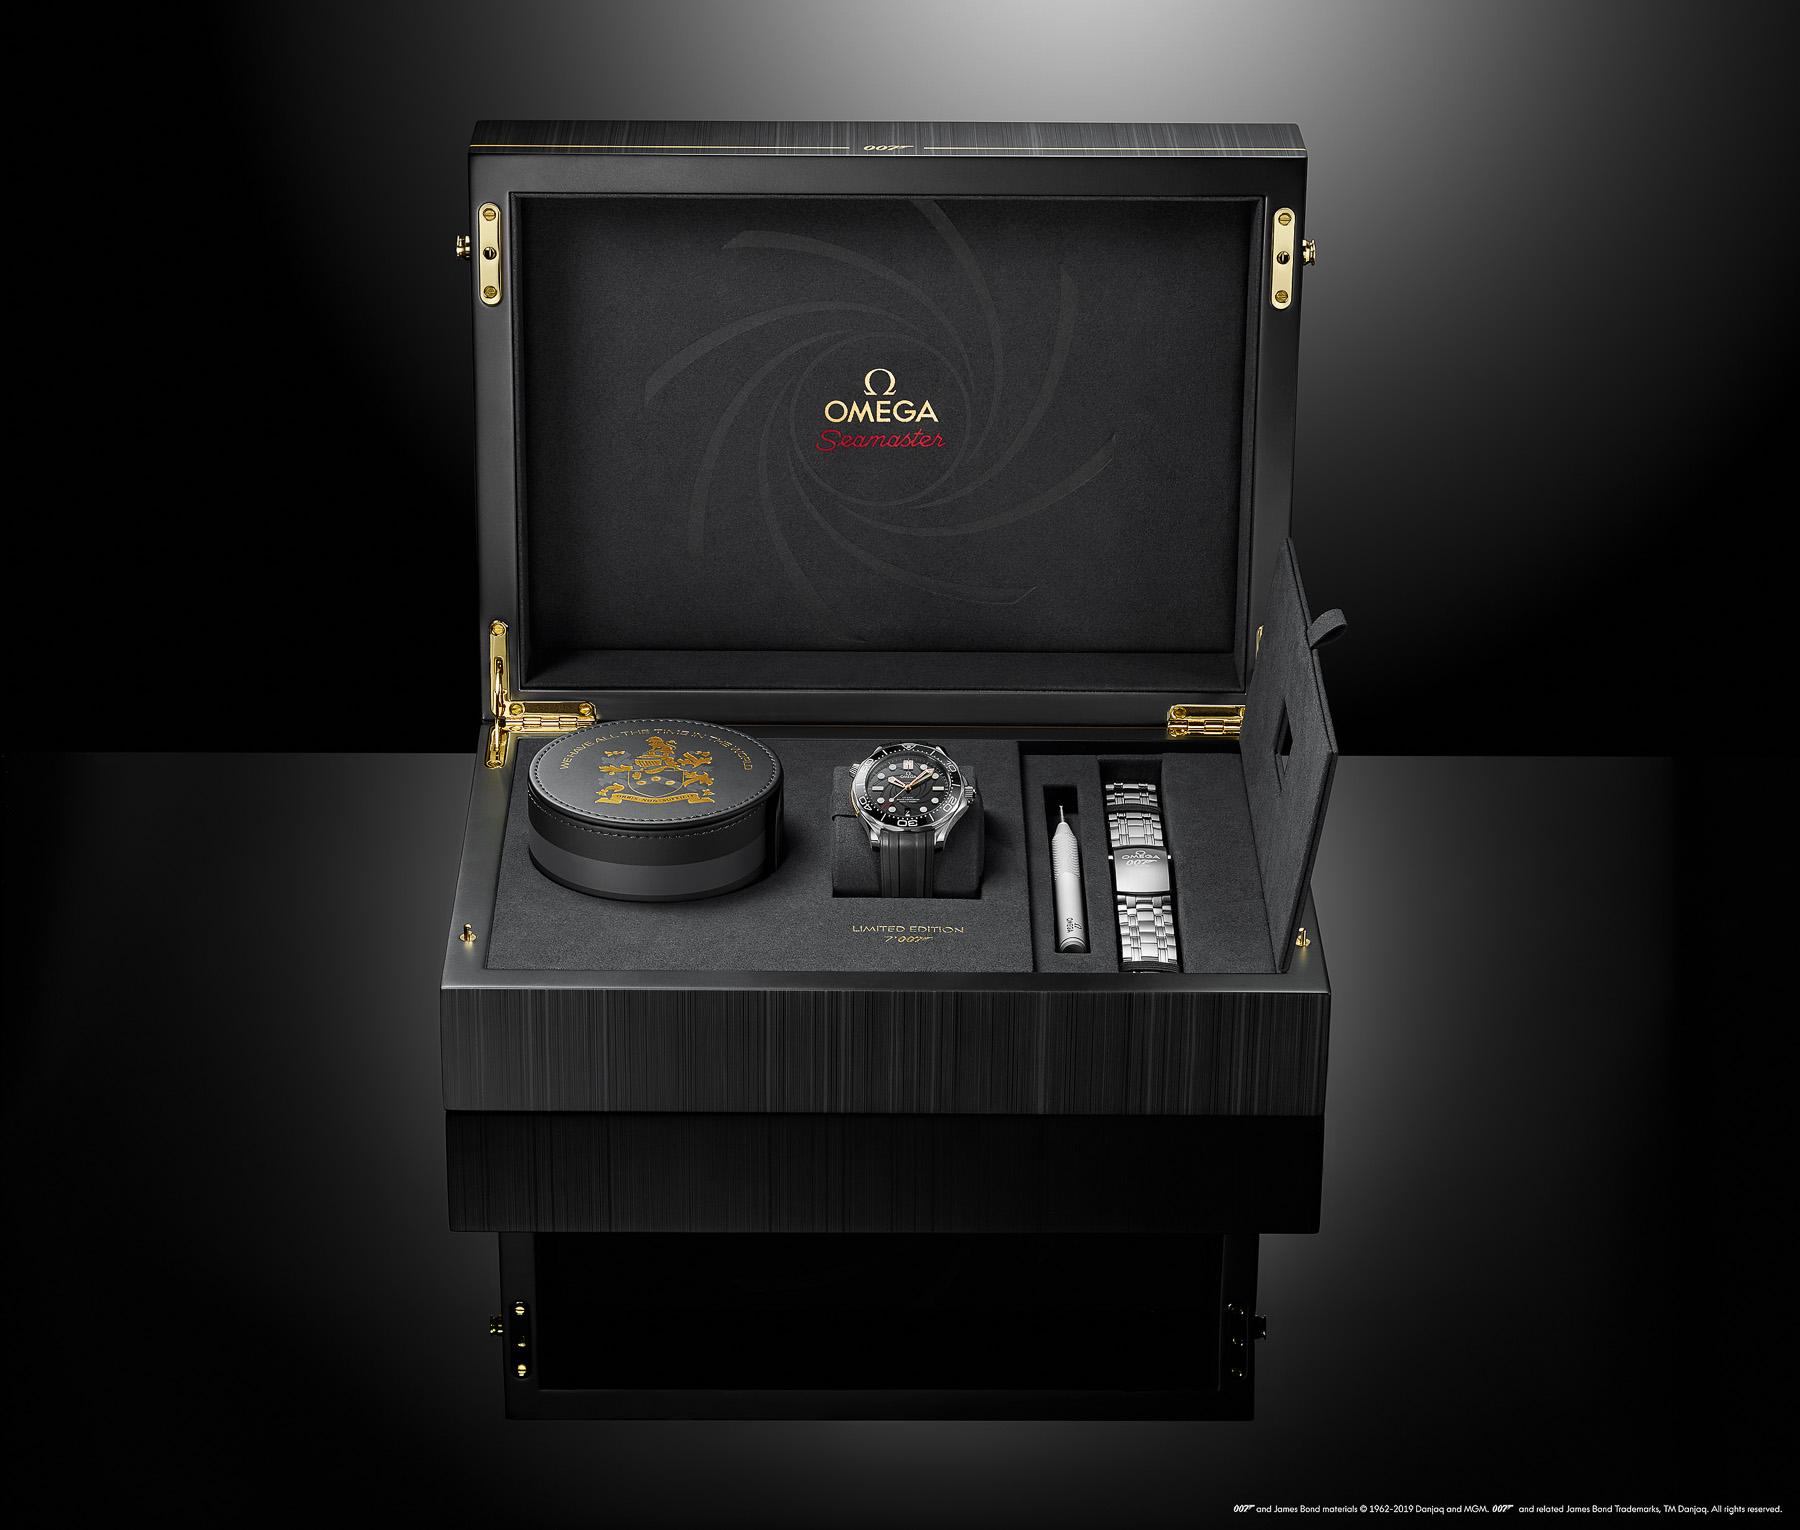 Omega Seamaster horloge: Omega Seamaster Diver 300M: het 007 James Bond horloge voor het 50-jarig jubileum in giftbox